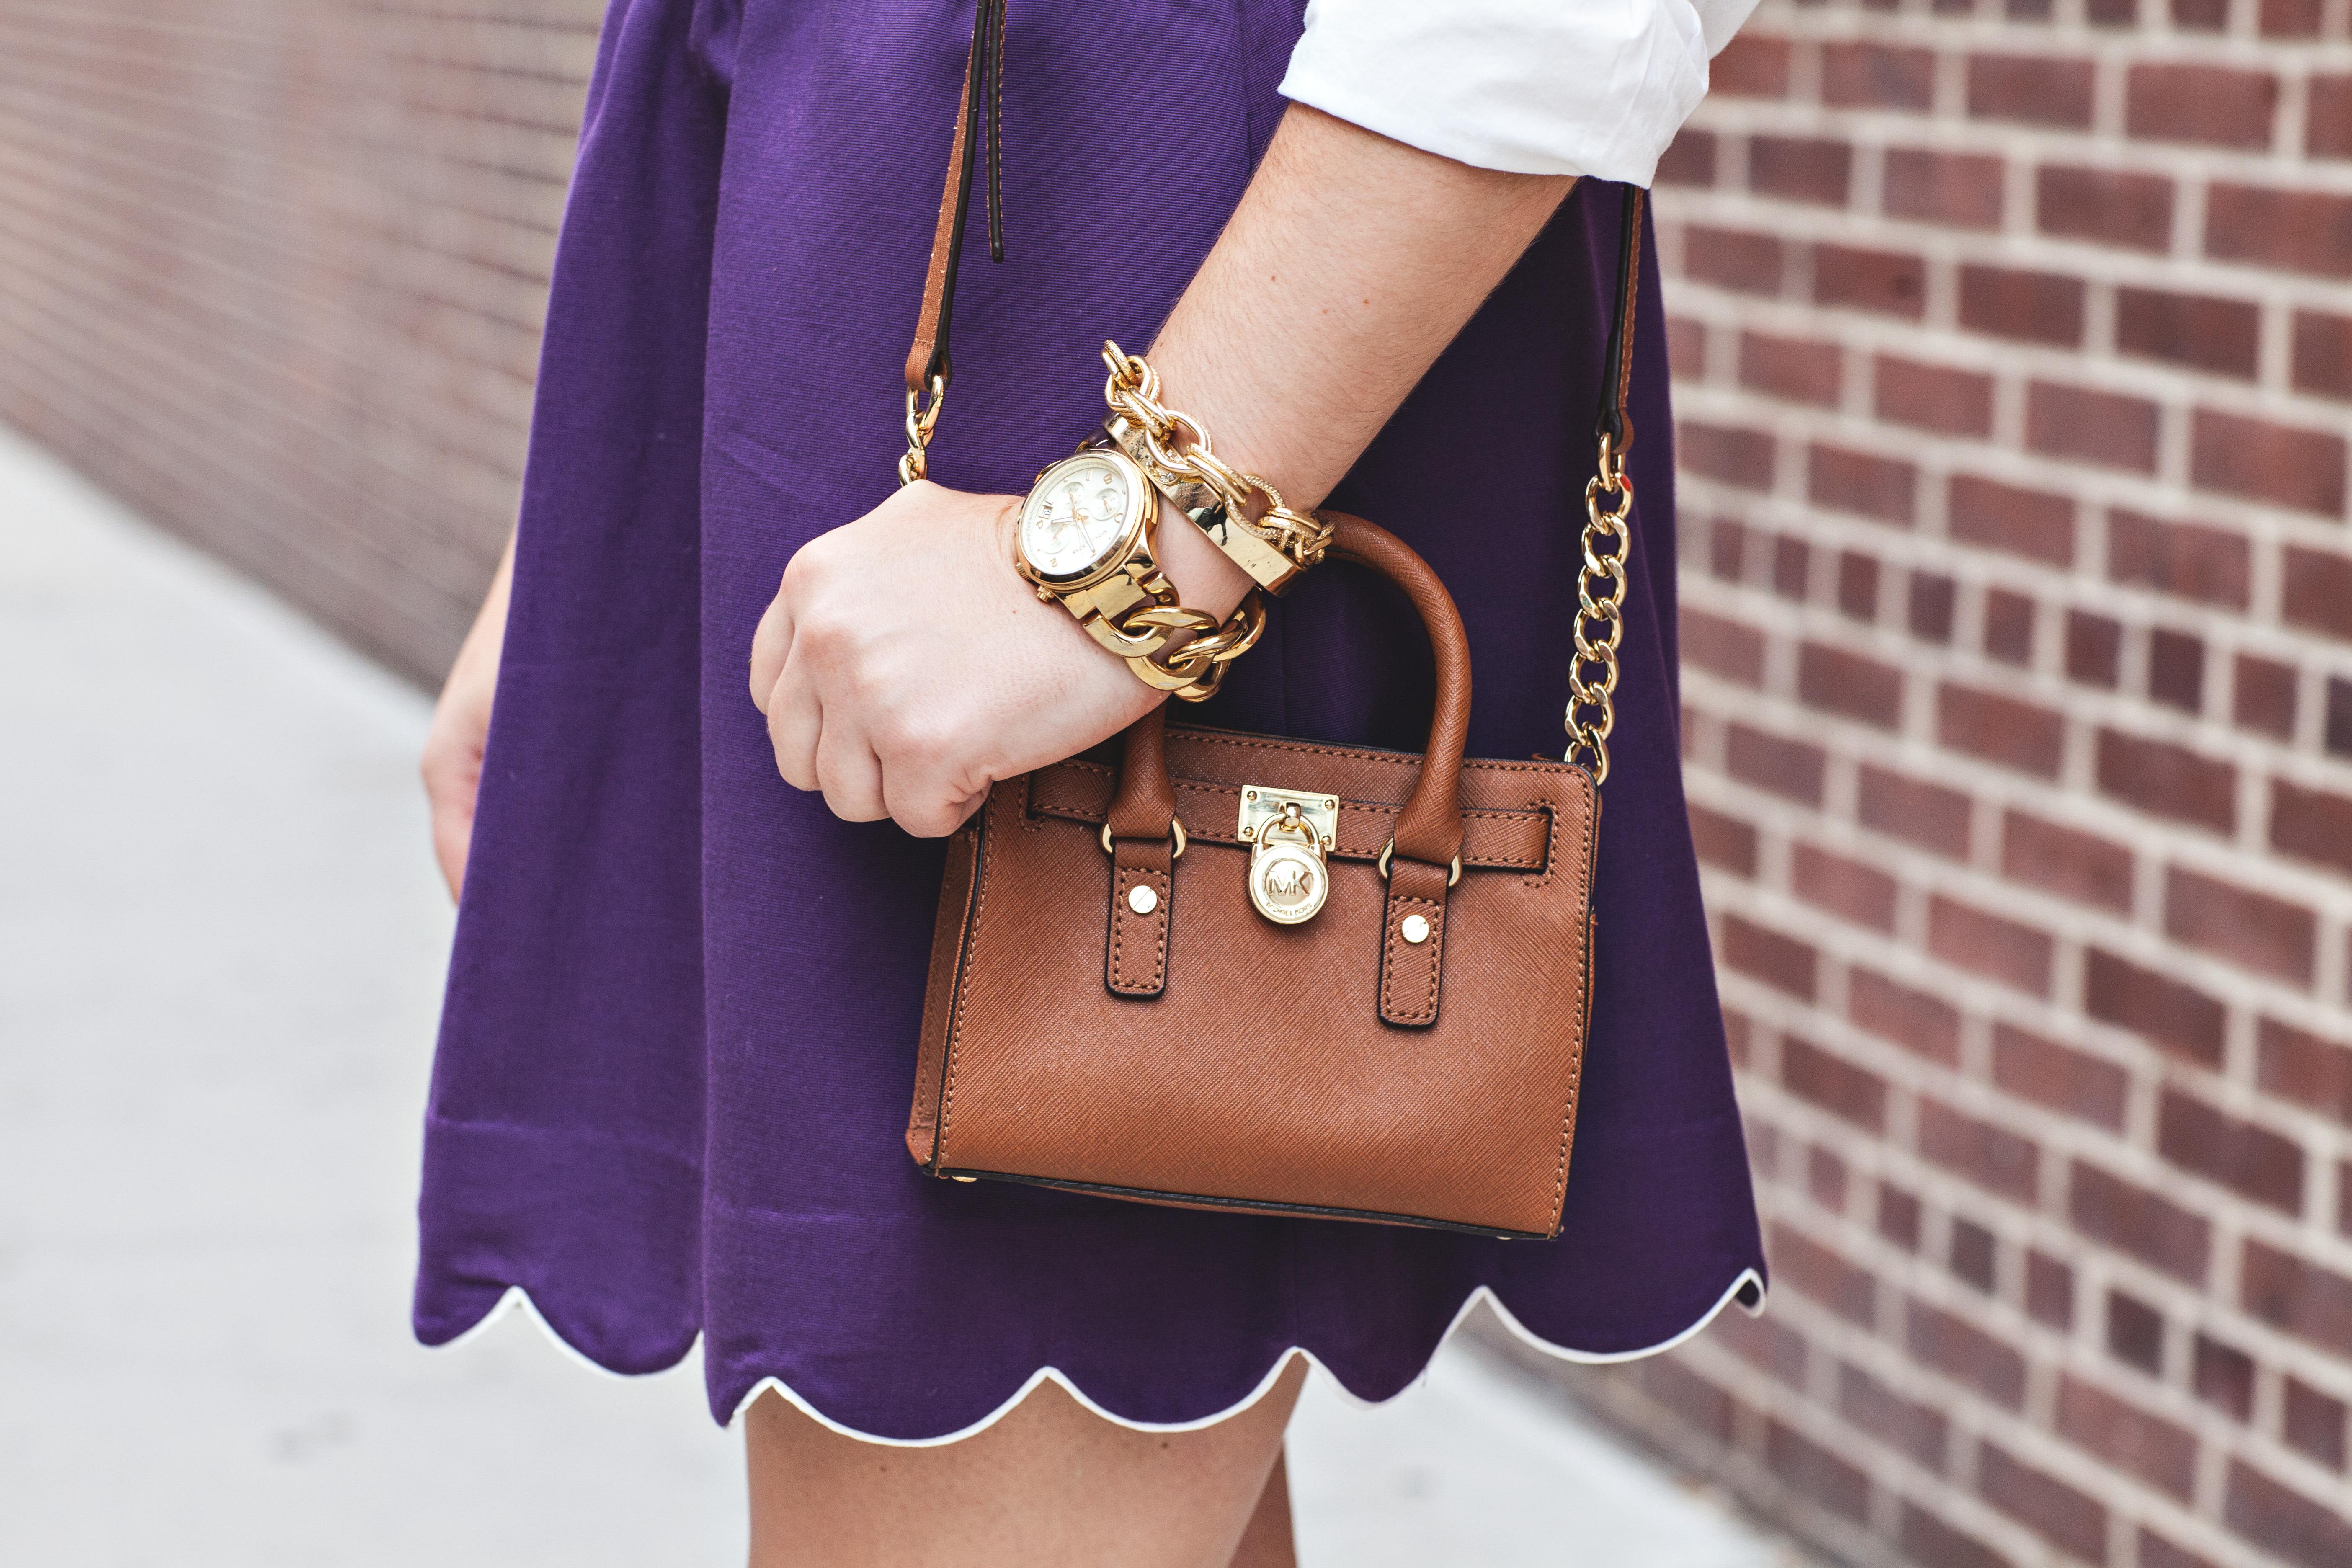 Michael Kors Philippines Designer handbags clothing